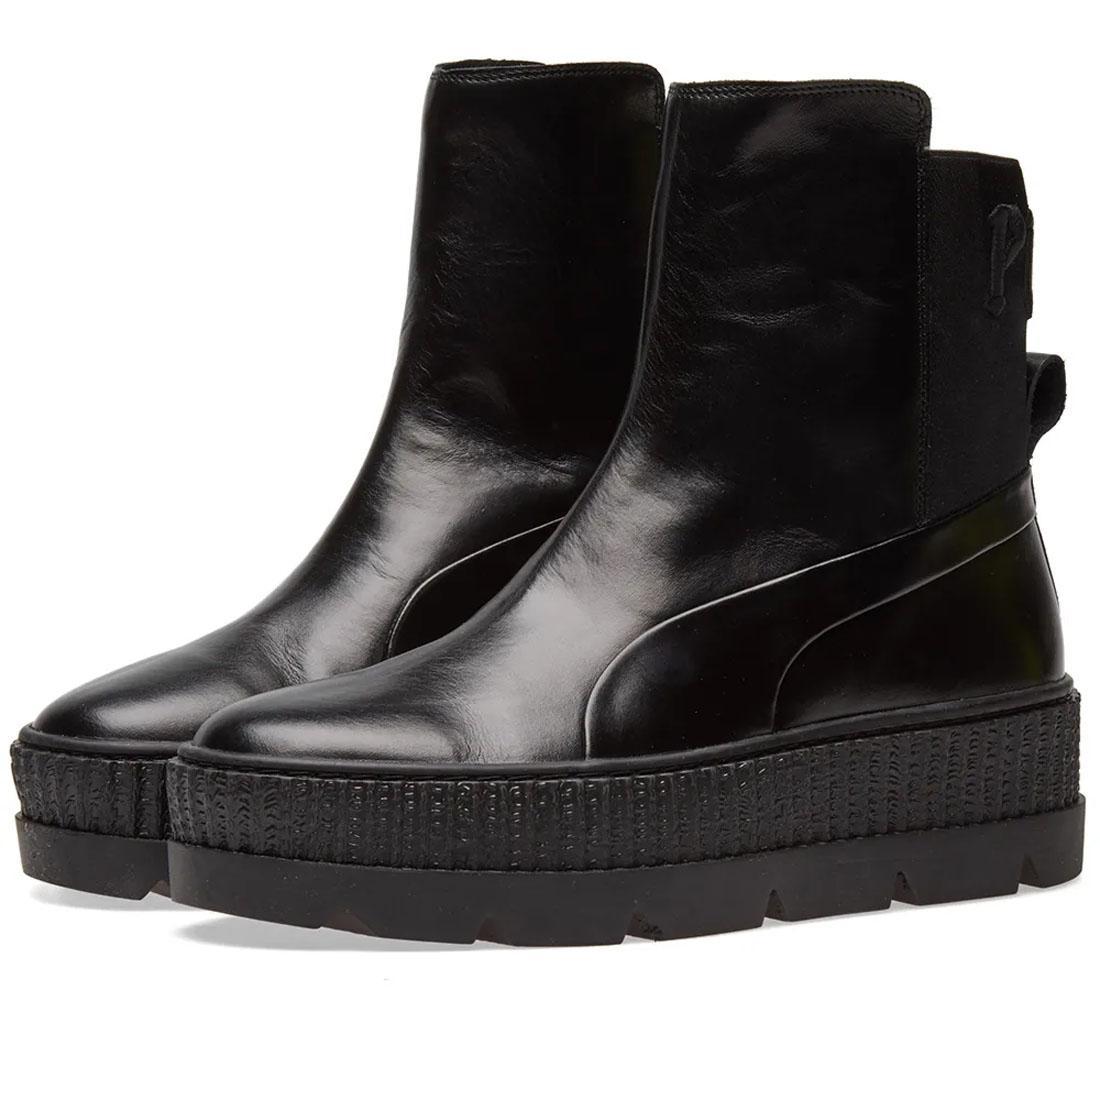 super popular f8374 ee971 Details about PUMA Fenty X Rihanna Chelsea Black Womens Sneaker Ladies  Creeper Platform Boots